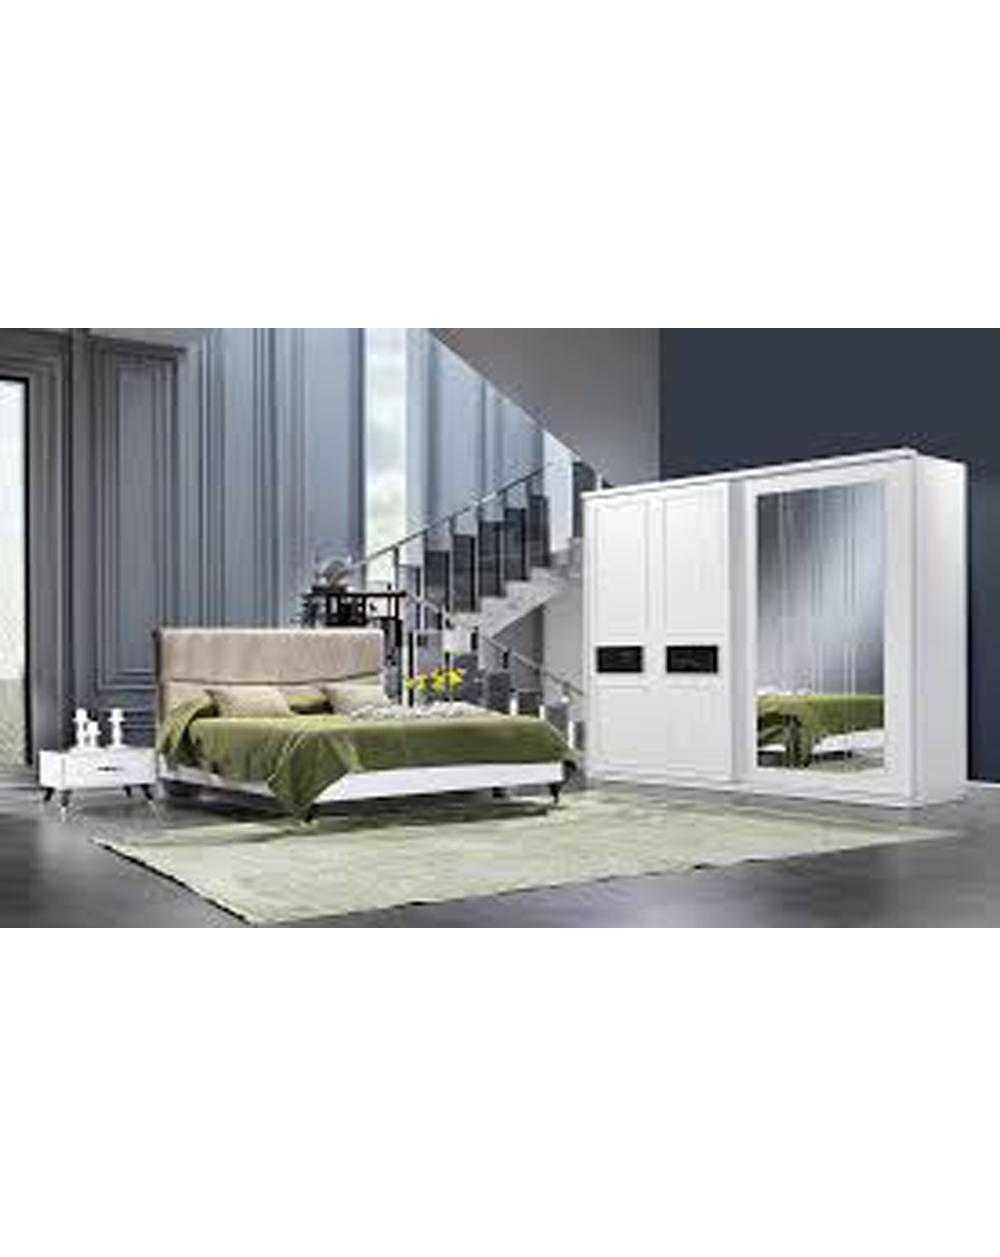 Berlin Moderne Komplett Schlafzimmer